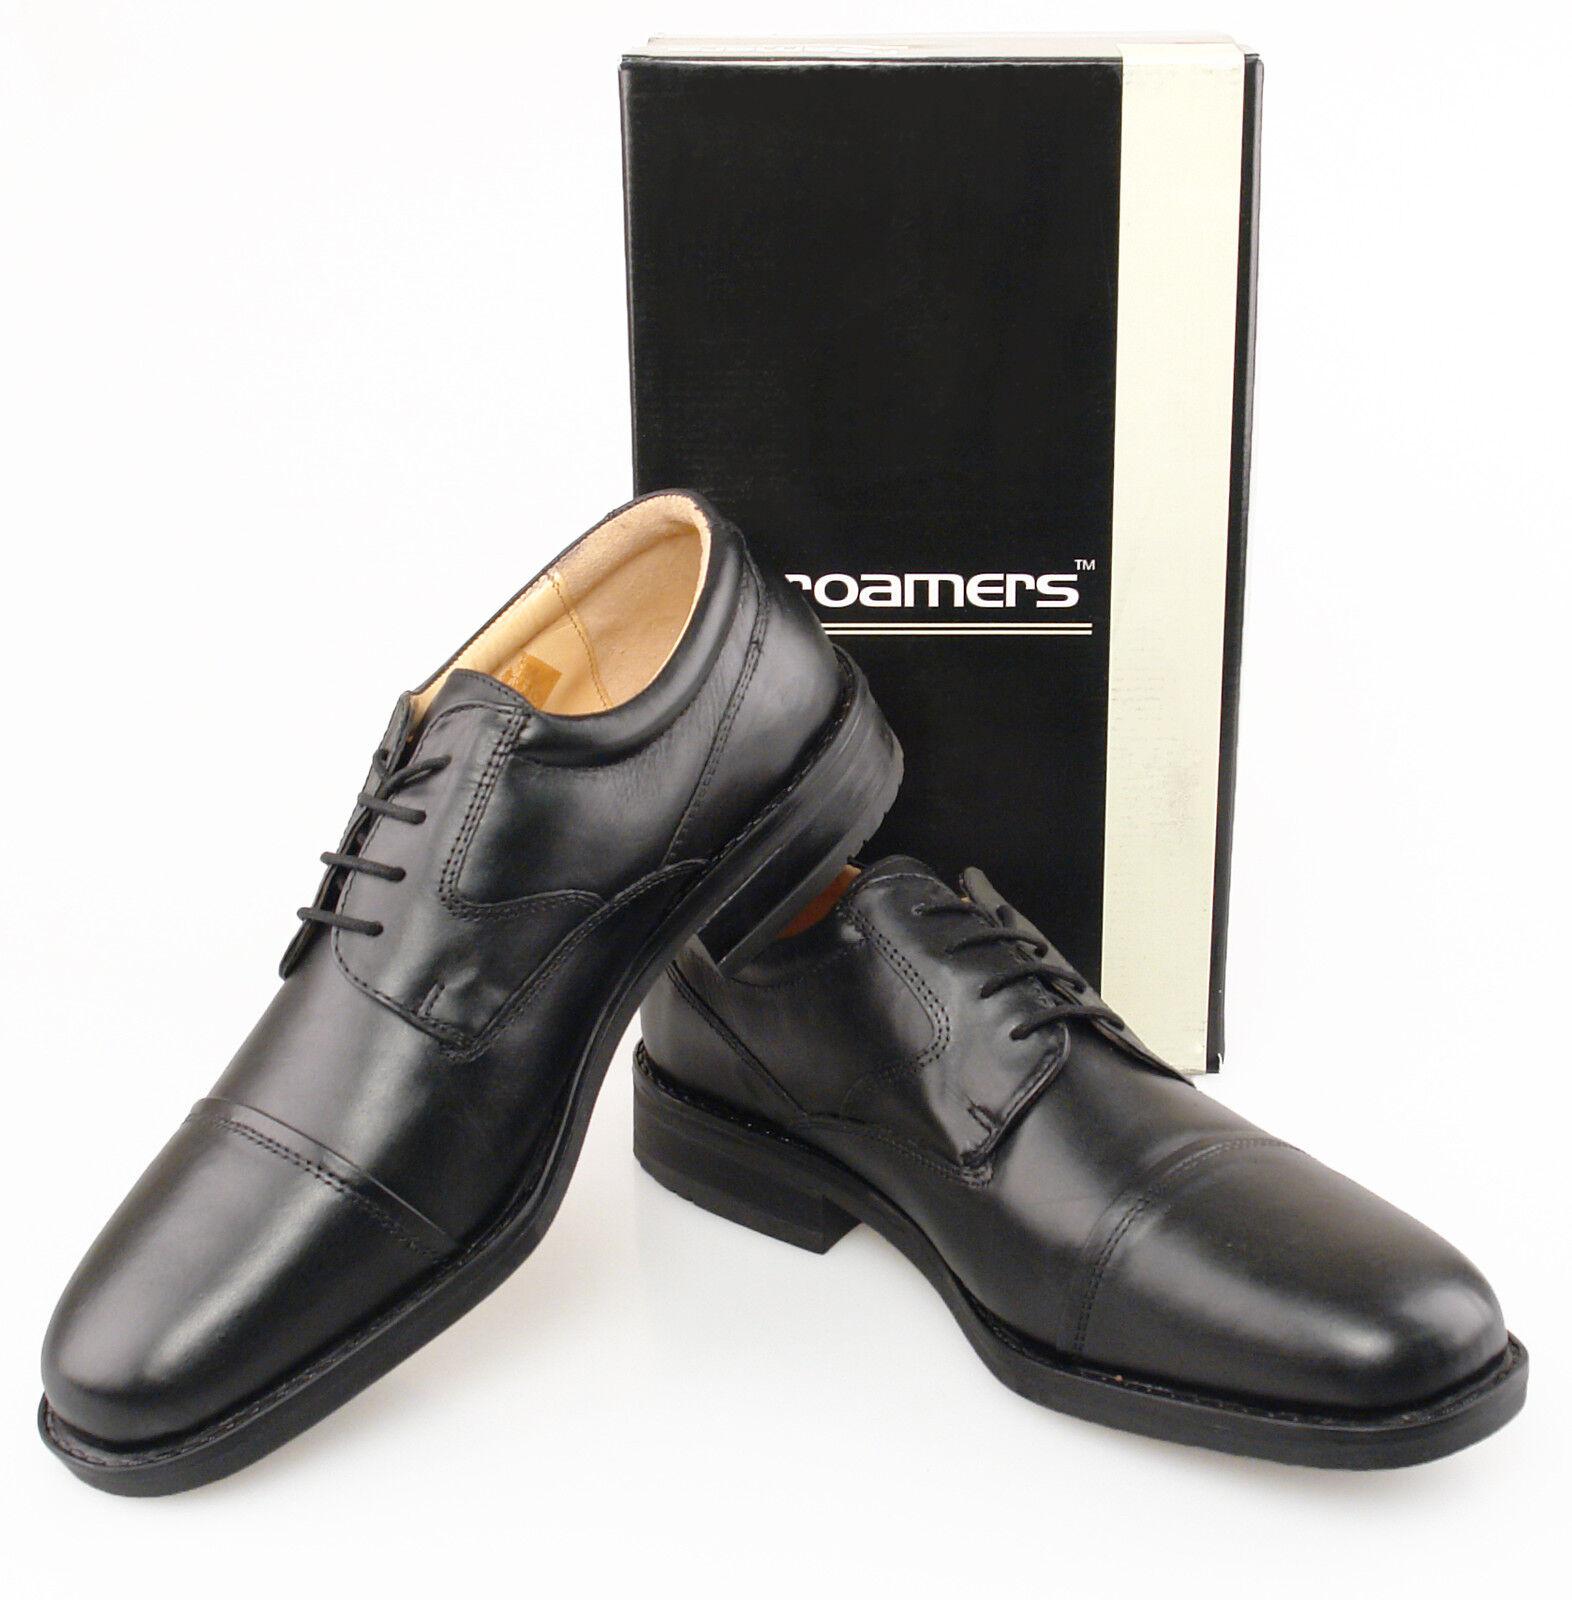 Mens Wide Fitting shoes Black Comfortable Smart Formal Fuller Fitting 6-13